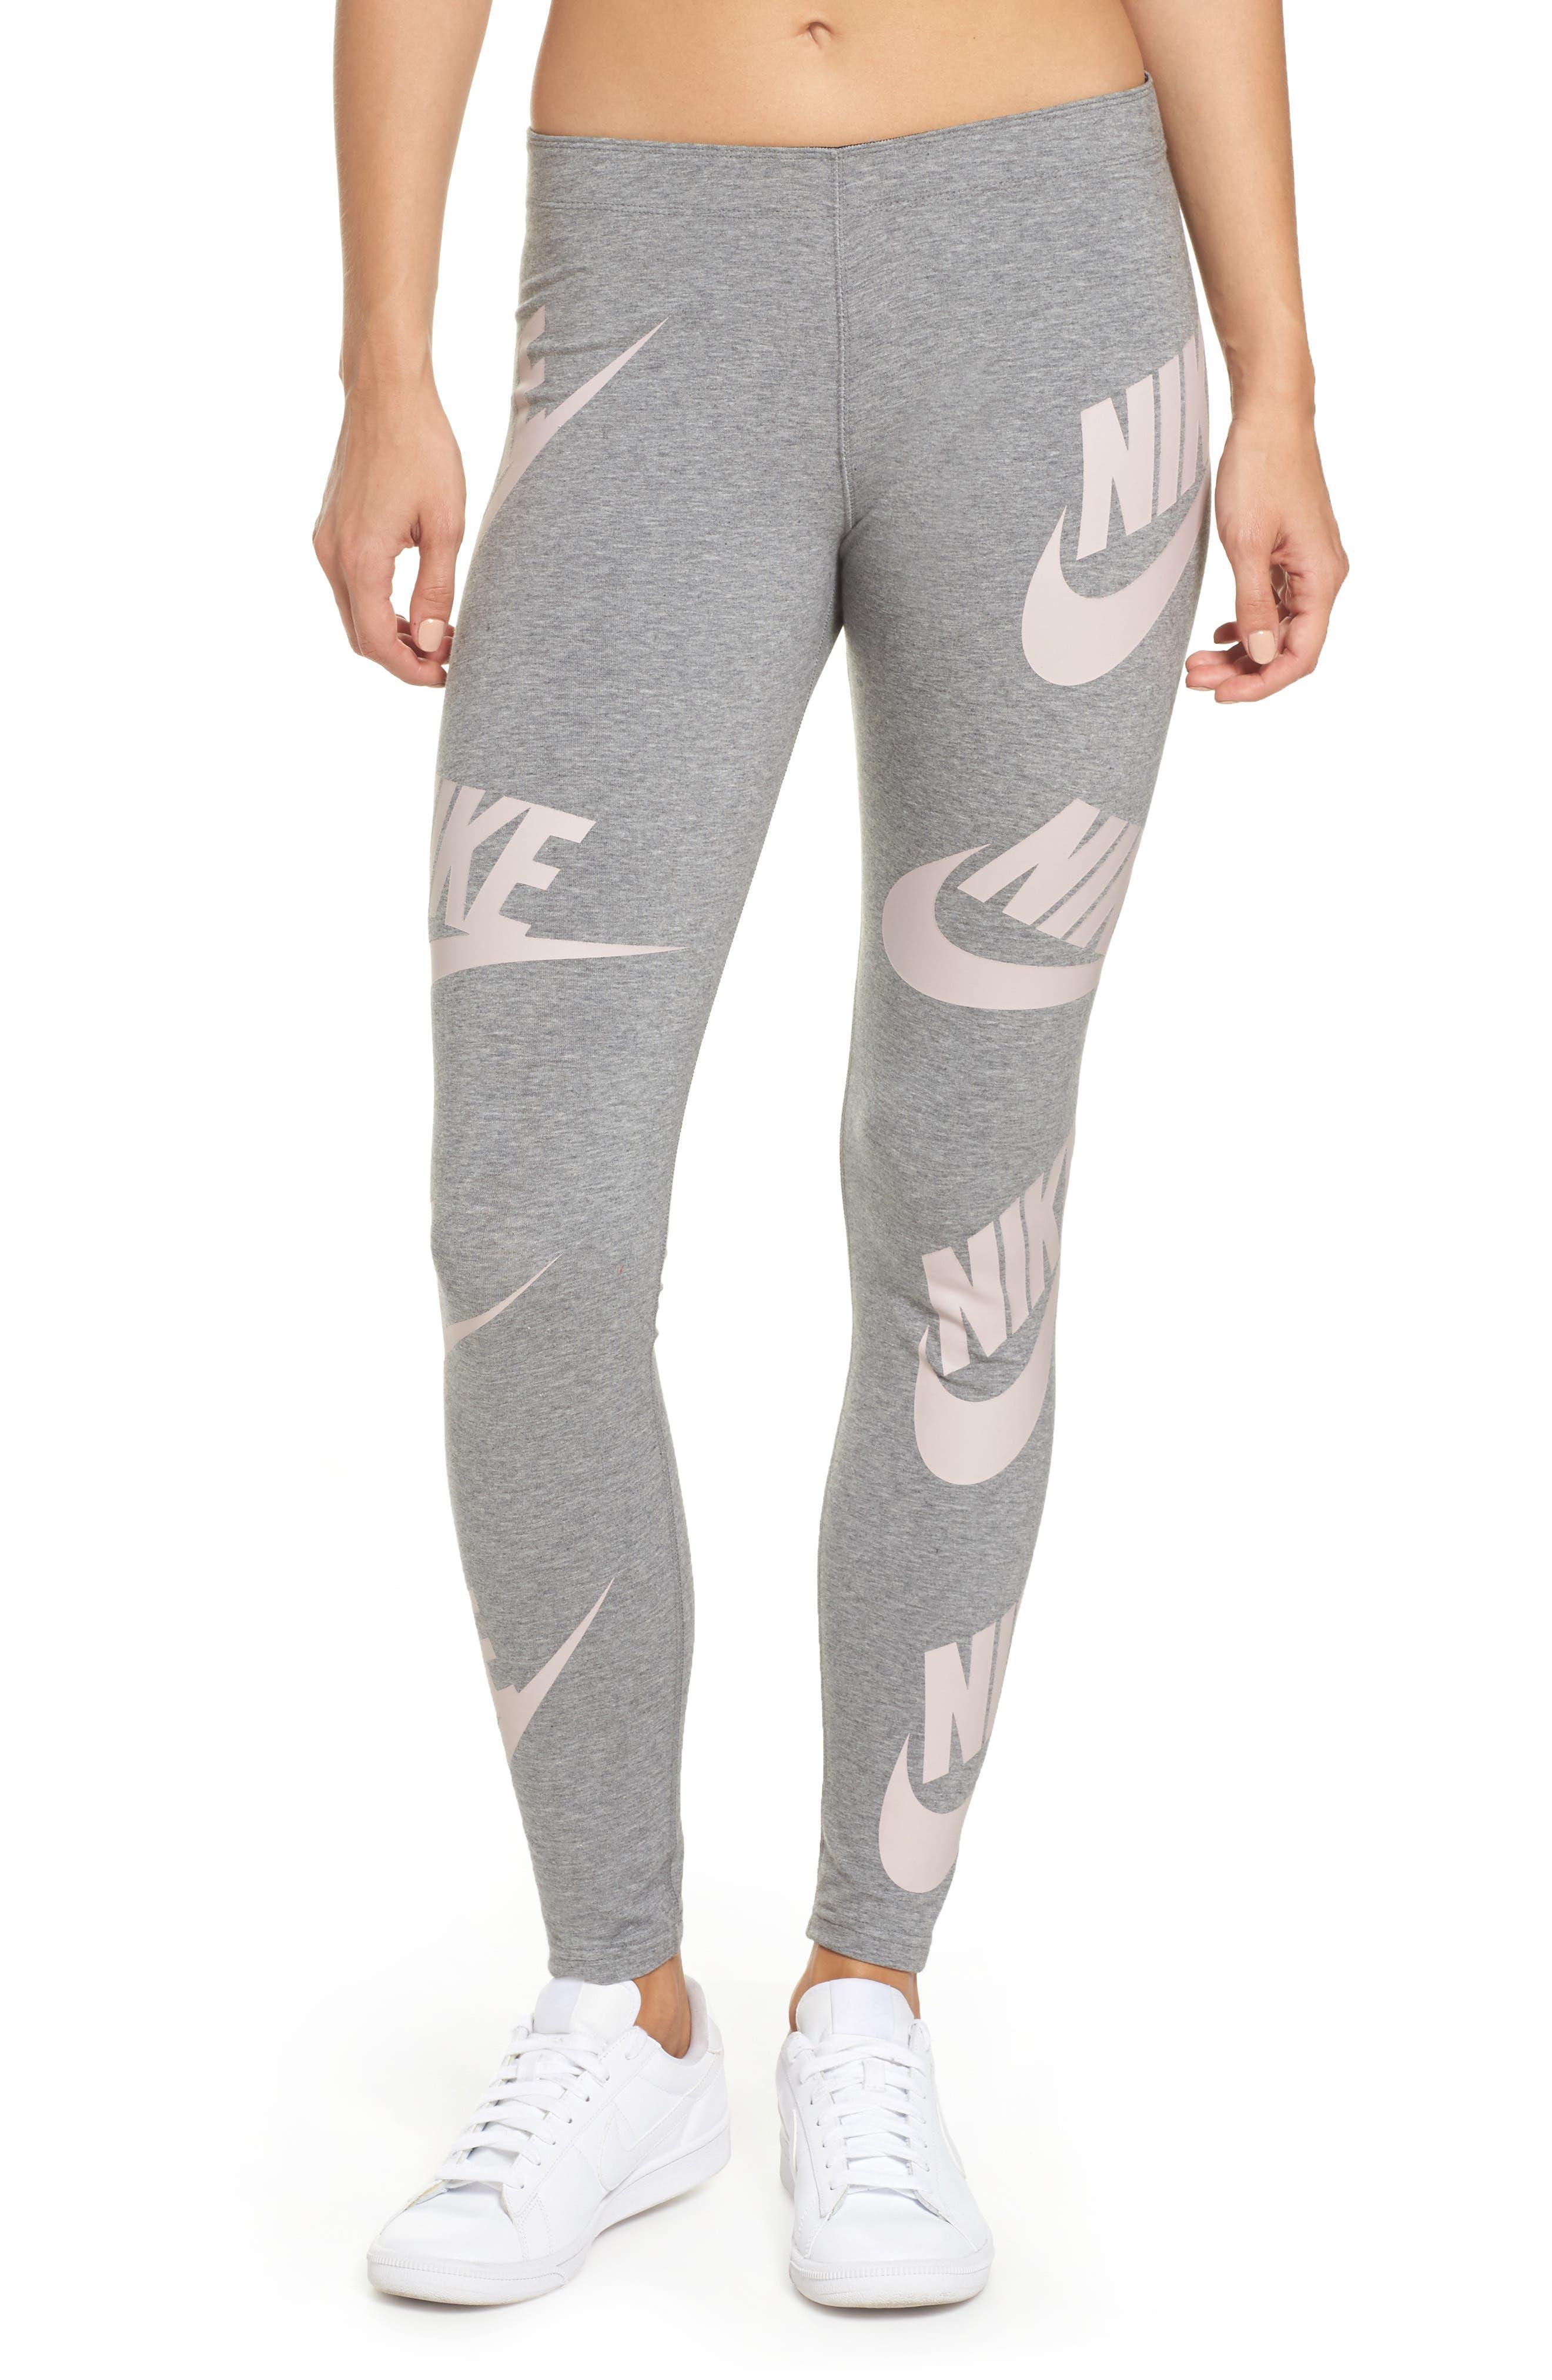 Sportswear Graphic Leggings,                         Main,                         color, Carbon Heather/Elemental Rose